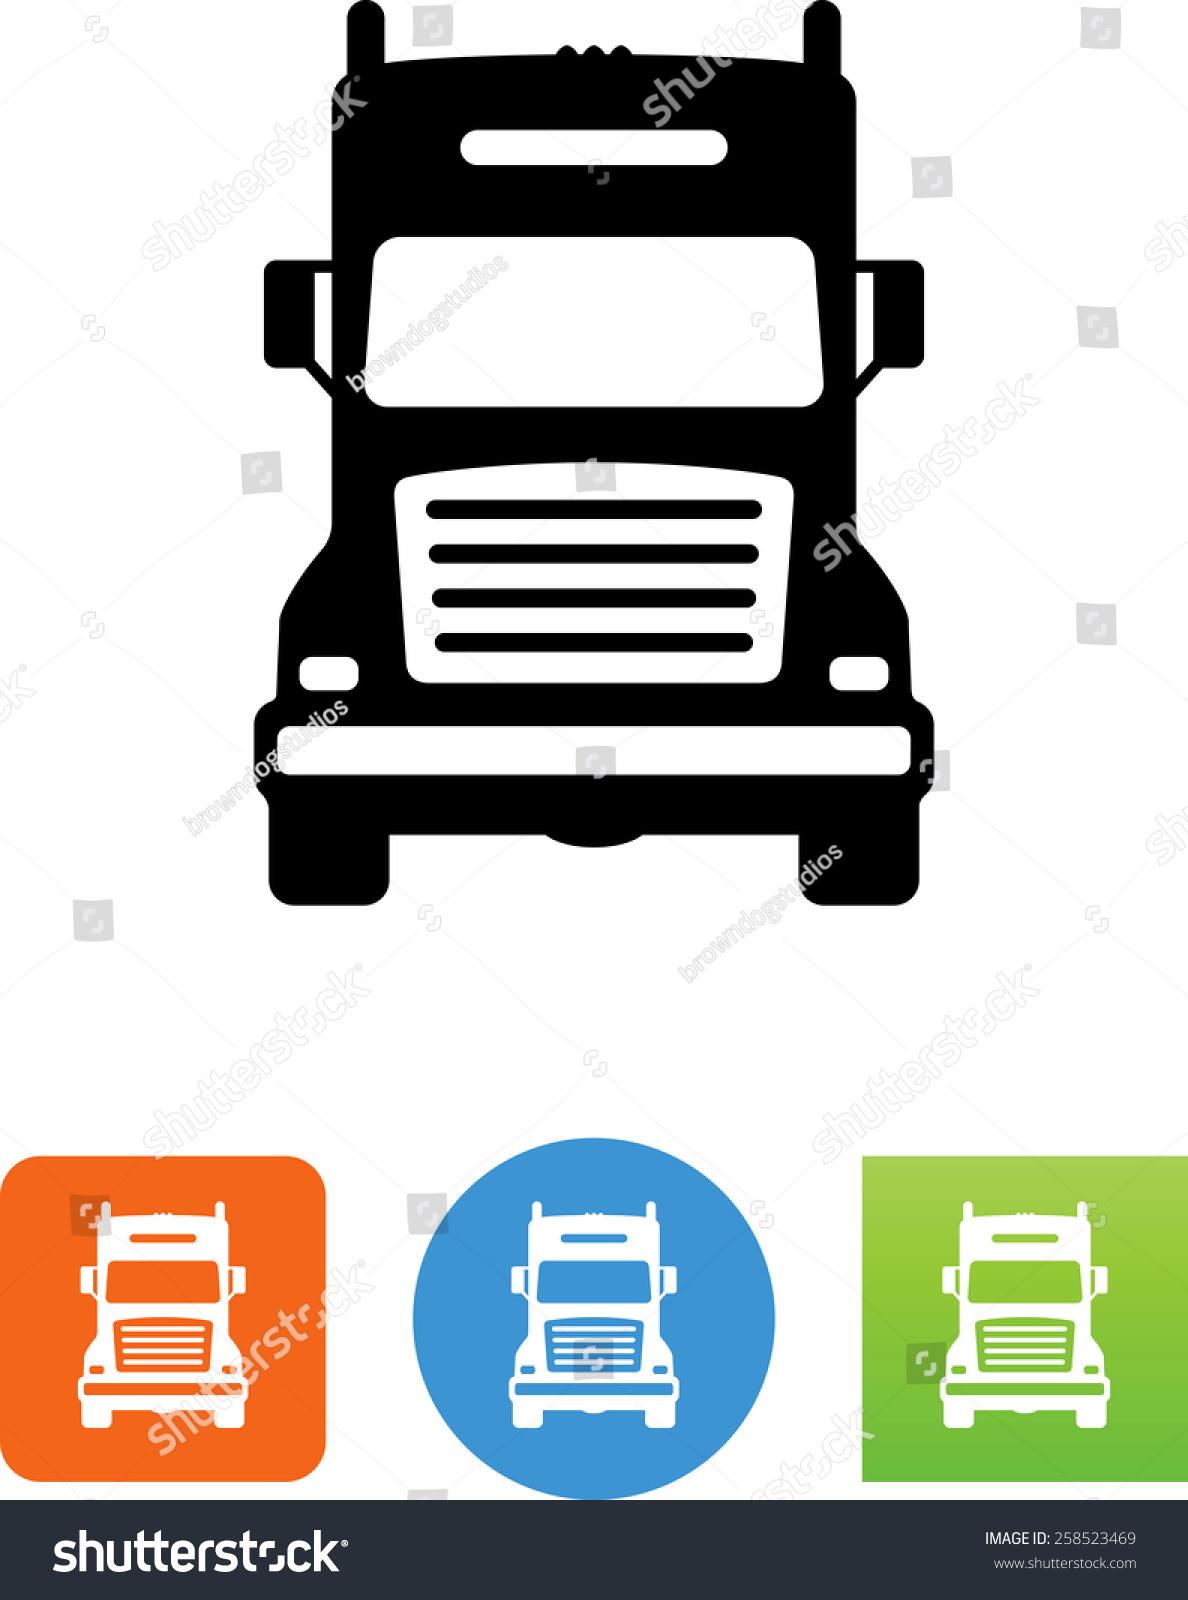 Truck symbol download vector icons video stock vector for Truck design app